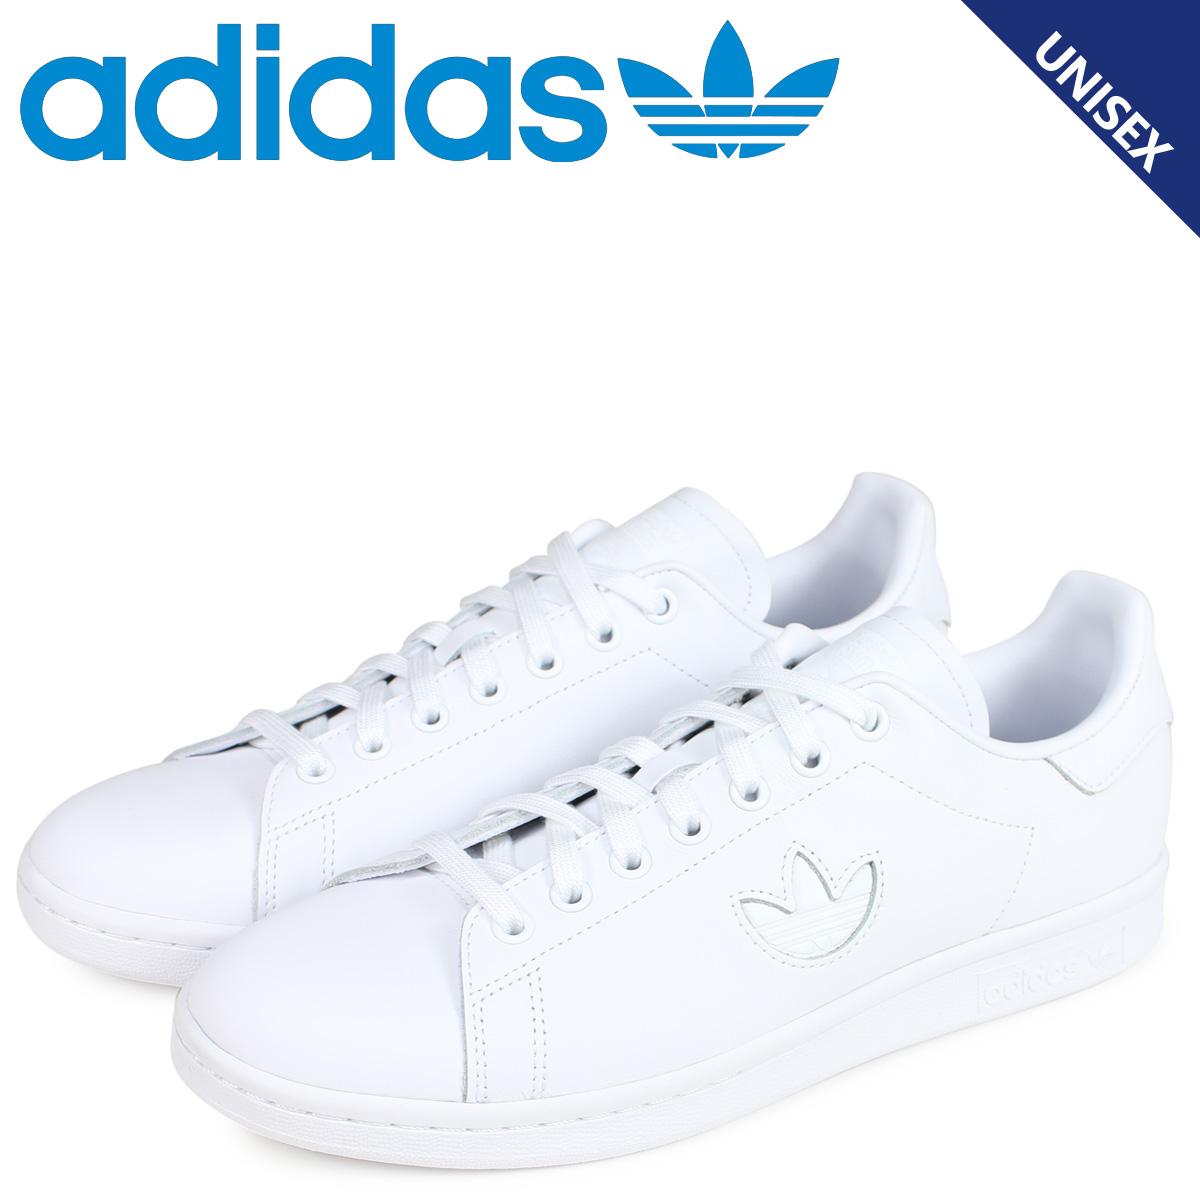 adidas Originals アディダス オリジナルス スタンスミス スニーカー メンズ レディース STAN SMITH ホワイト 白 BD7451 [3/26 新入荷]